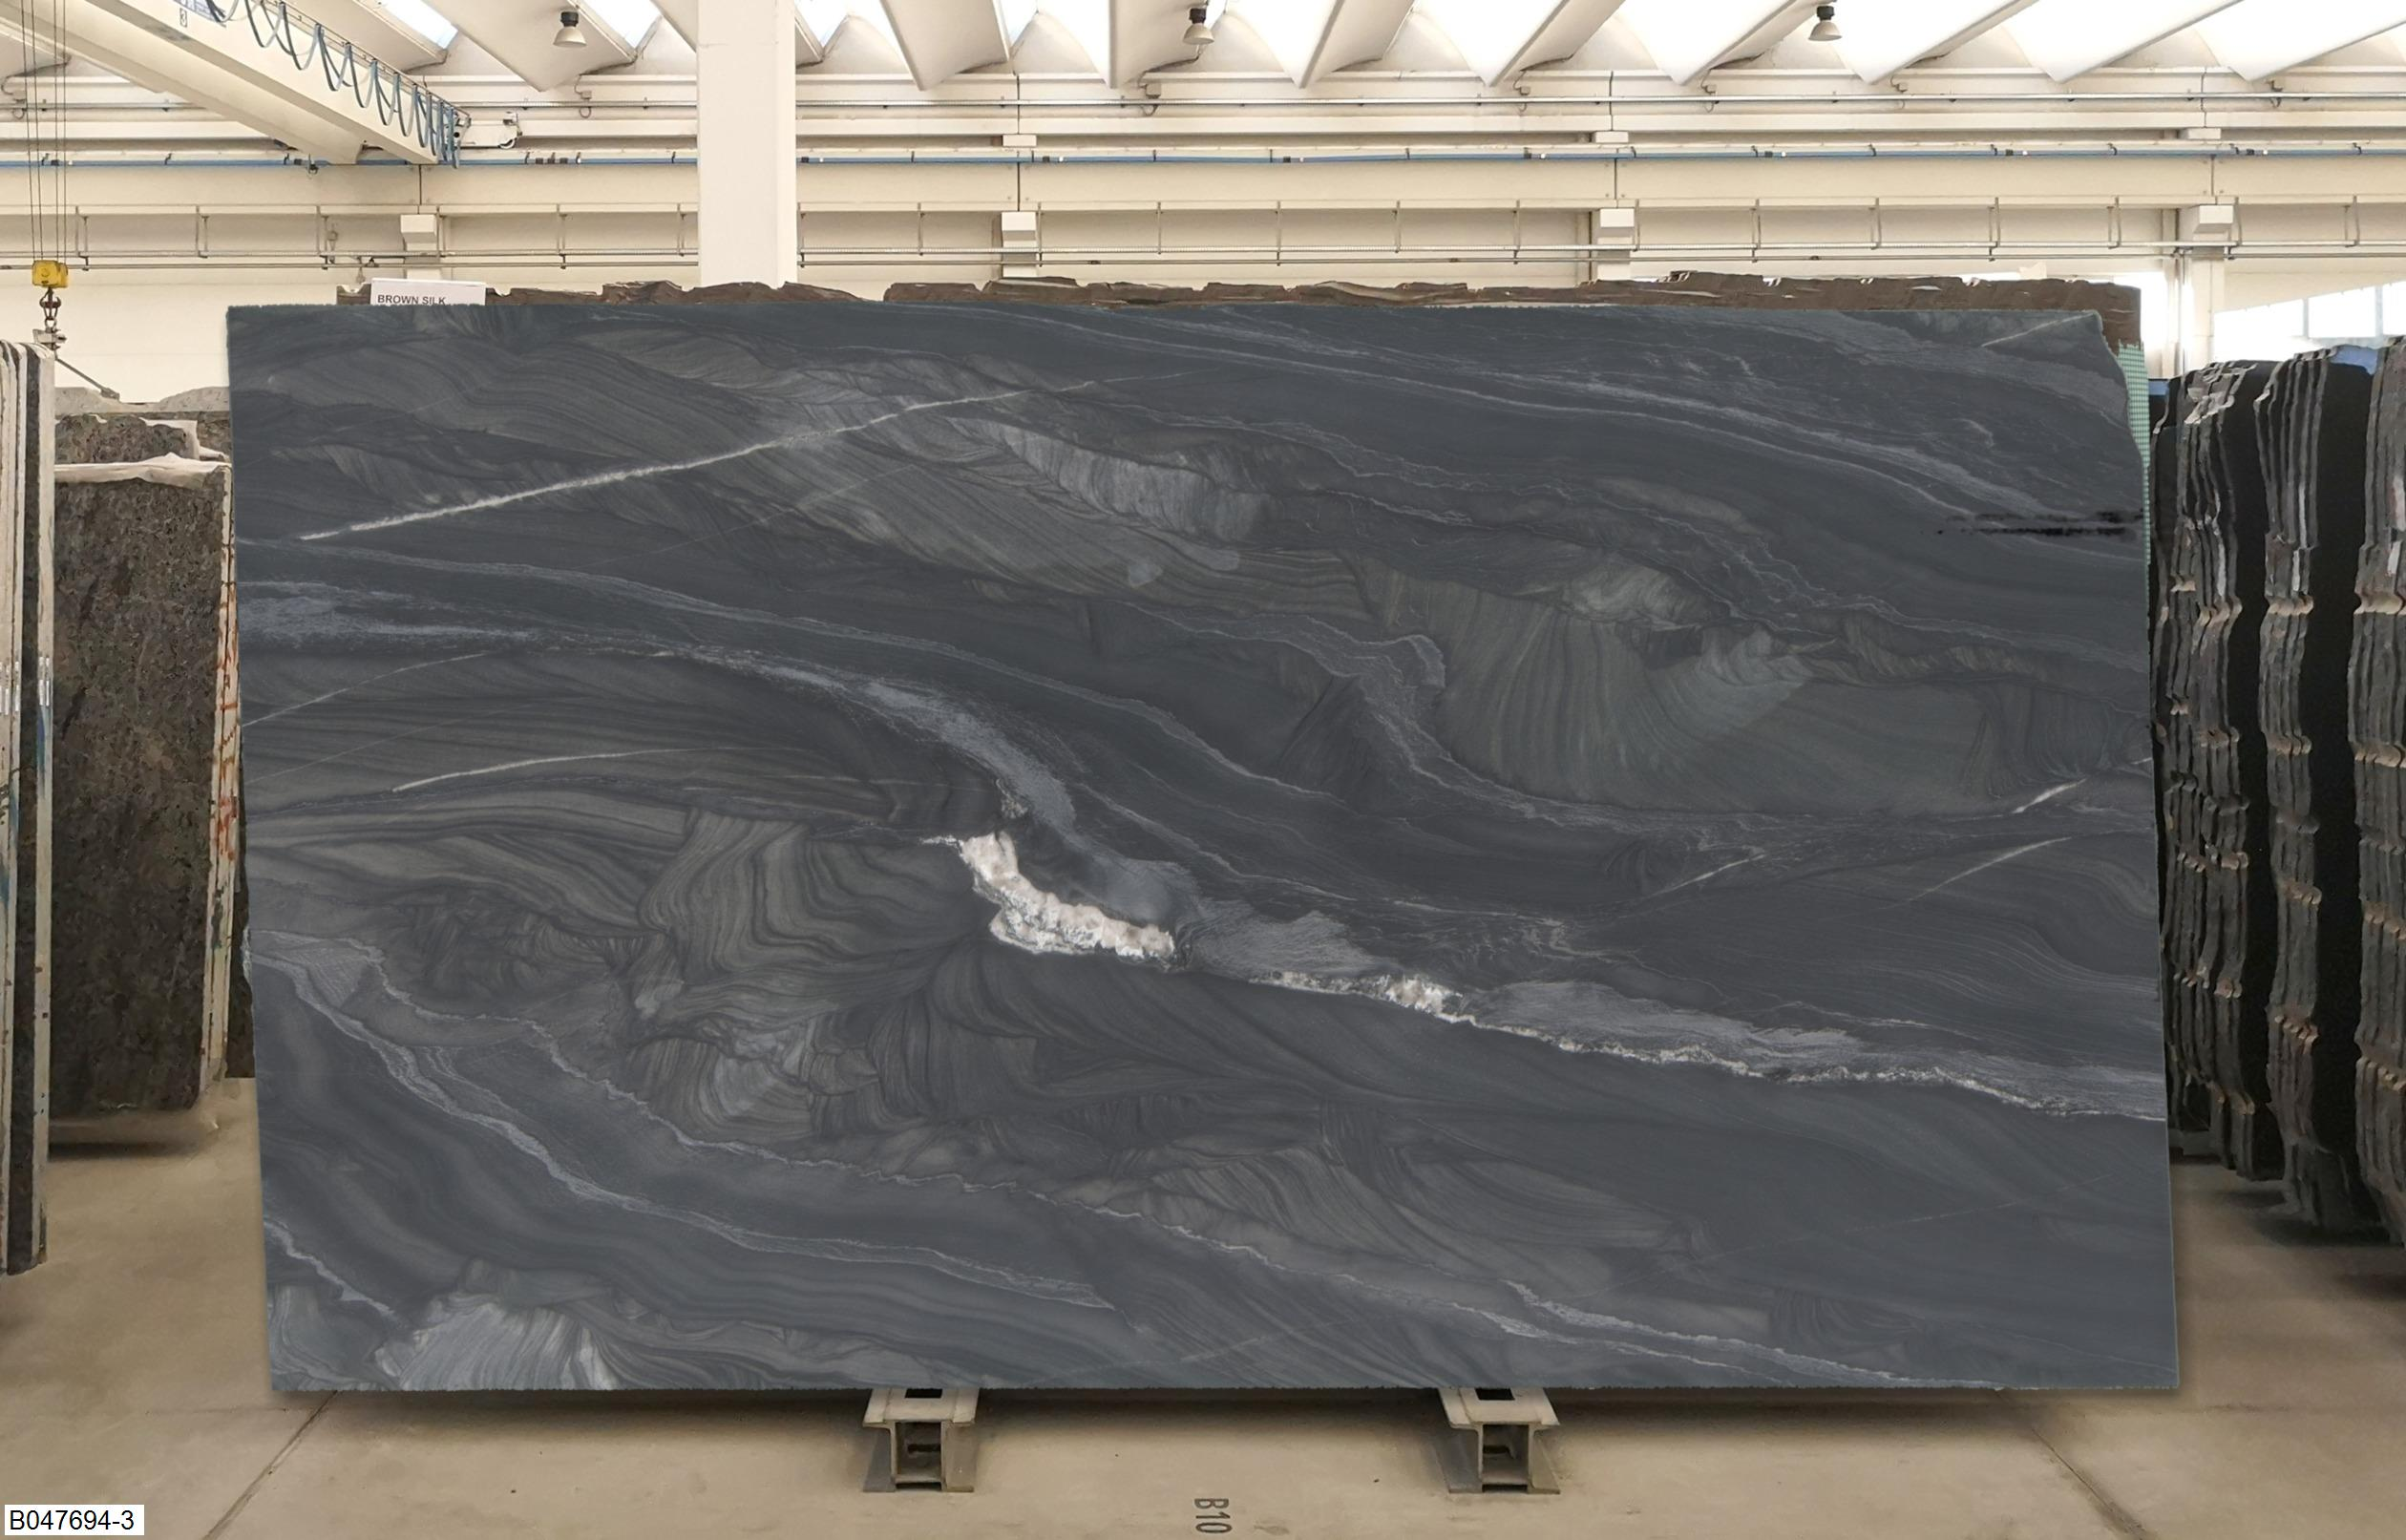 BLACK TEMPEST - LASTRE SATINATE-MACCHIA APERTA Foto: 1_59695_39238.jpg